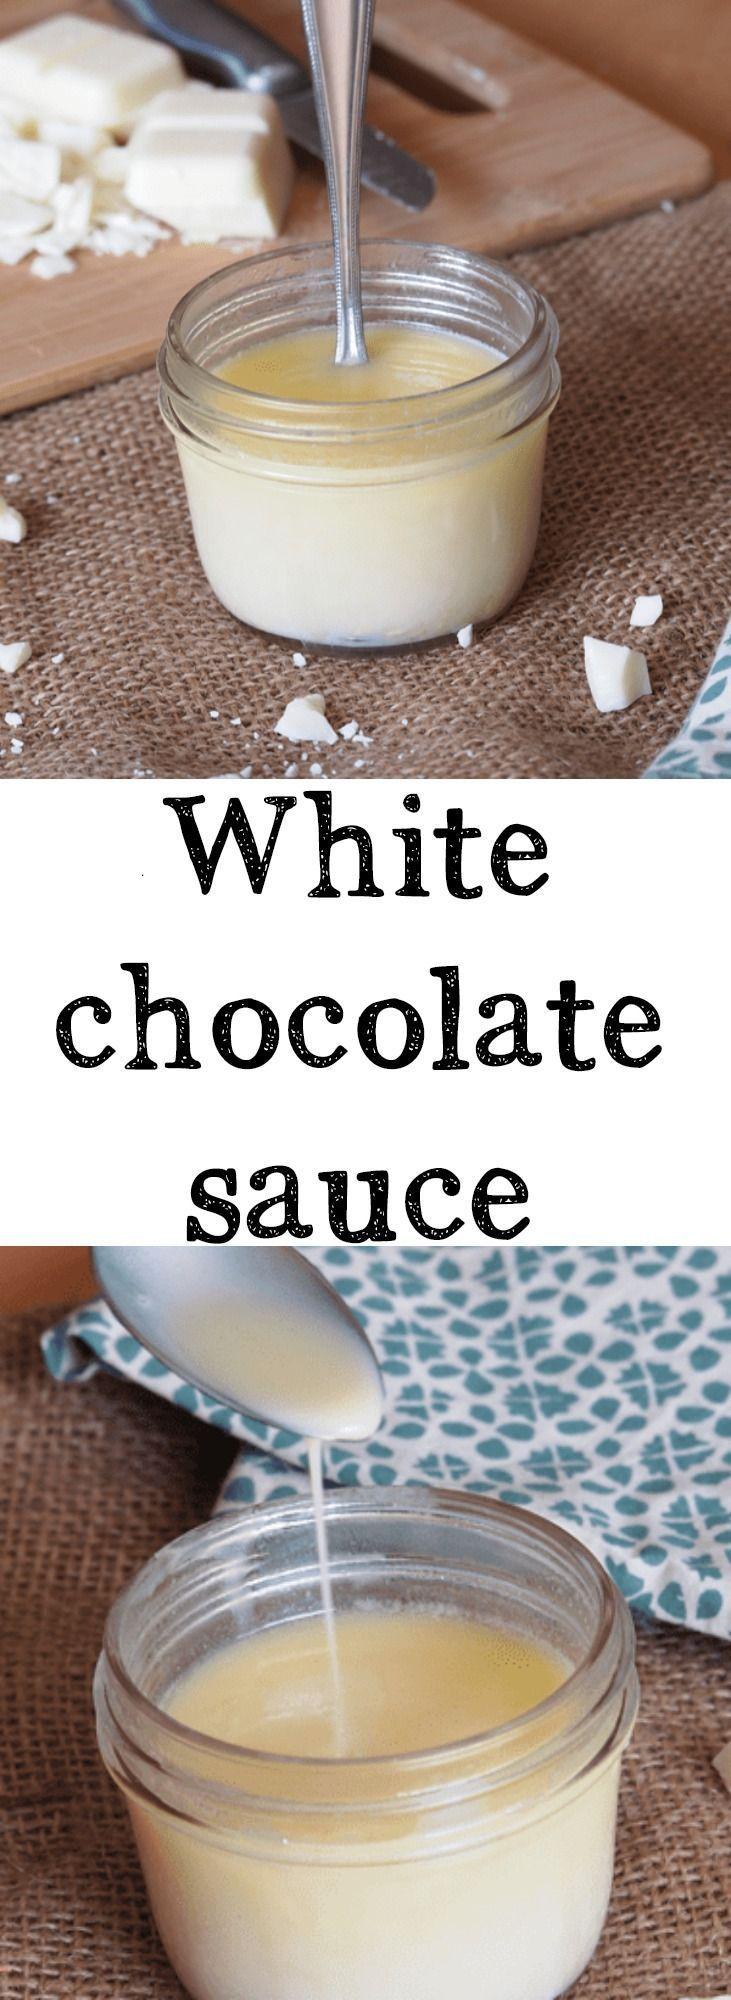 How to make homemade white chocolate sauce this recipe